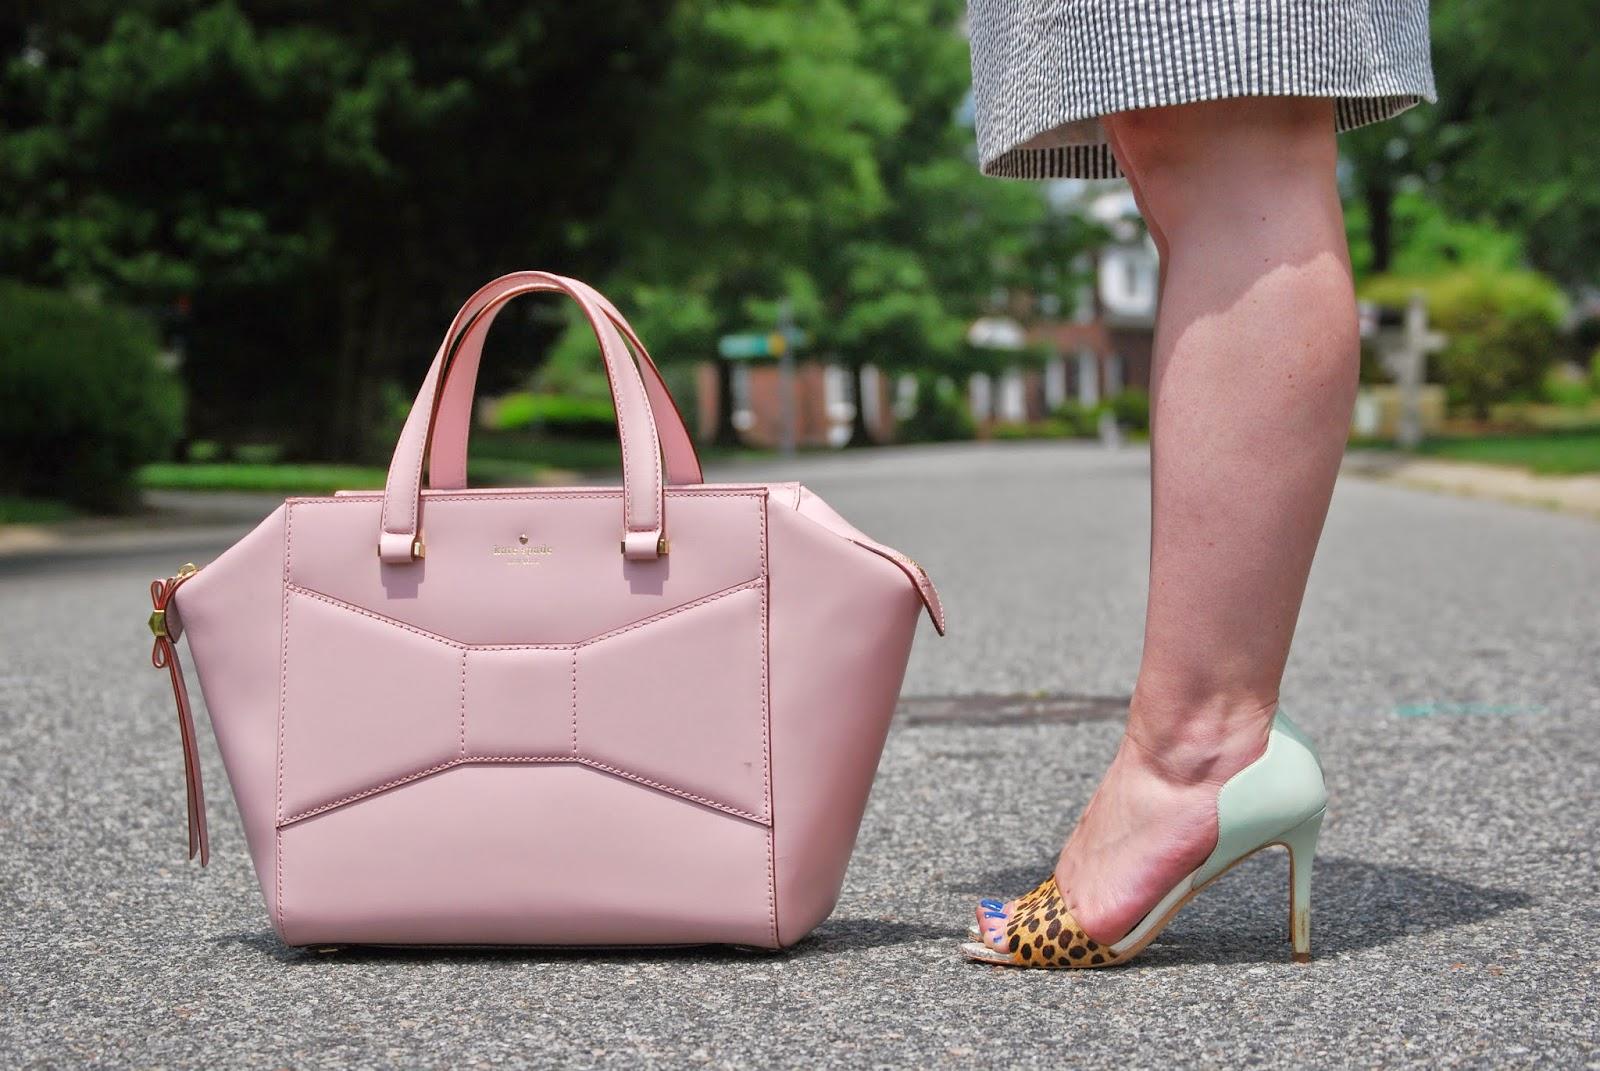 Kate Spade Beau Bag, Loeffler Randall, leopard shoes, pineapple print